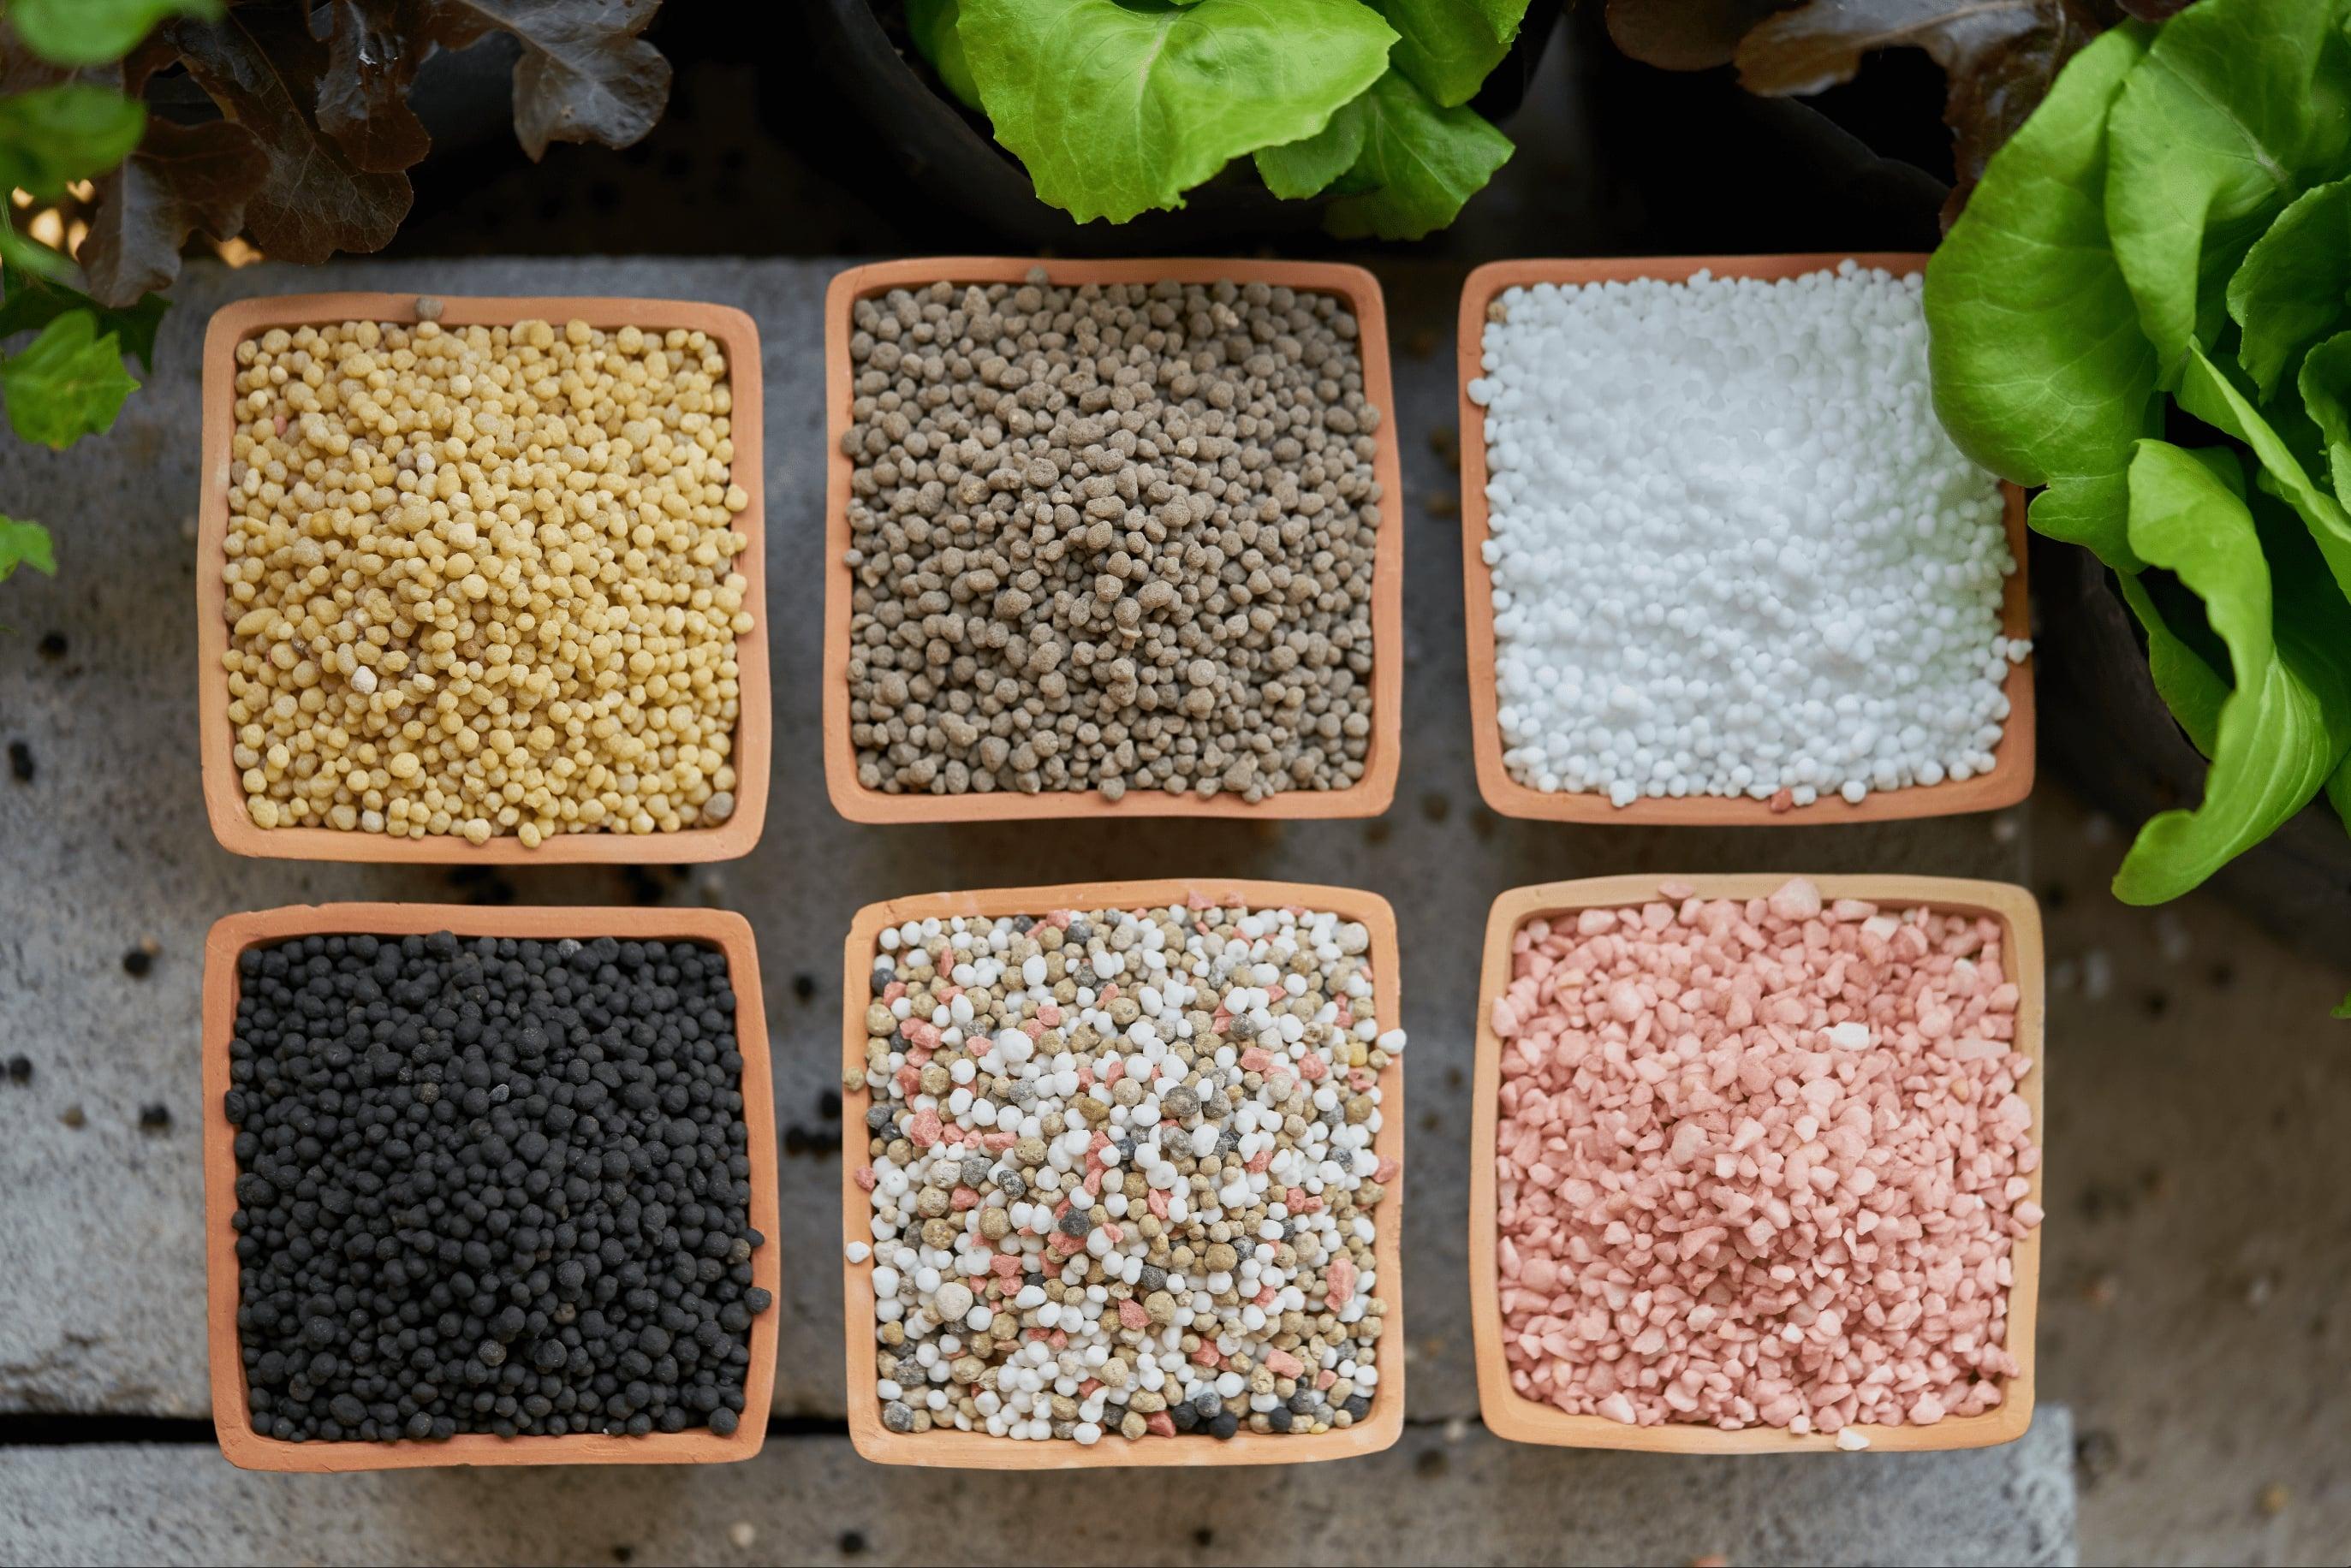 Common types of fertilizers